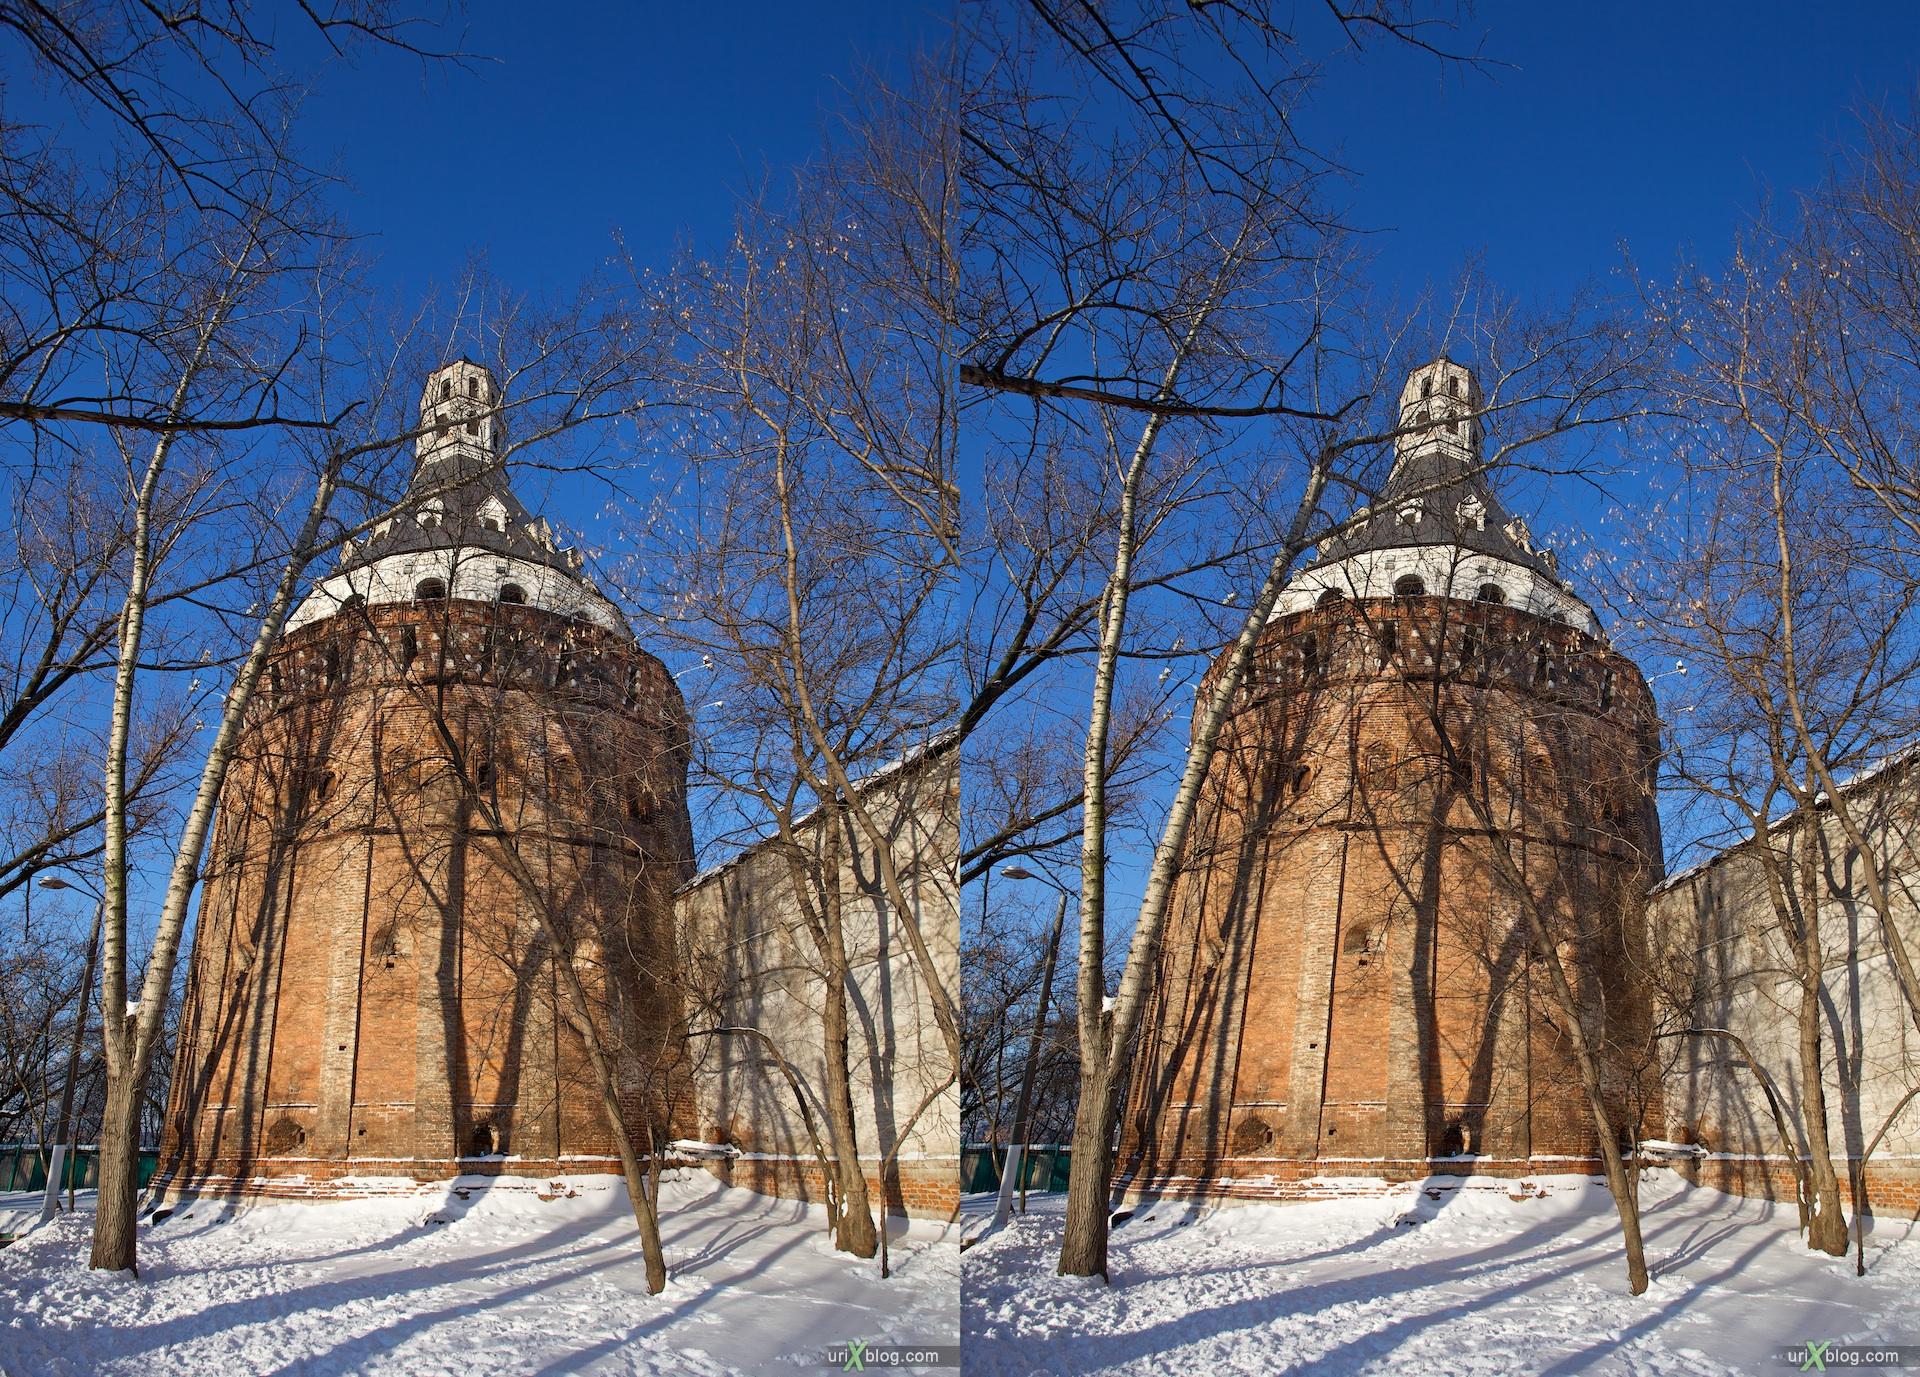 2010 3D, stereo, cross-eyed, стерео, стереопара Moscow, Москва, Симонов монастырь